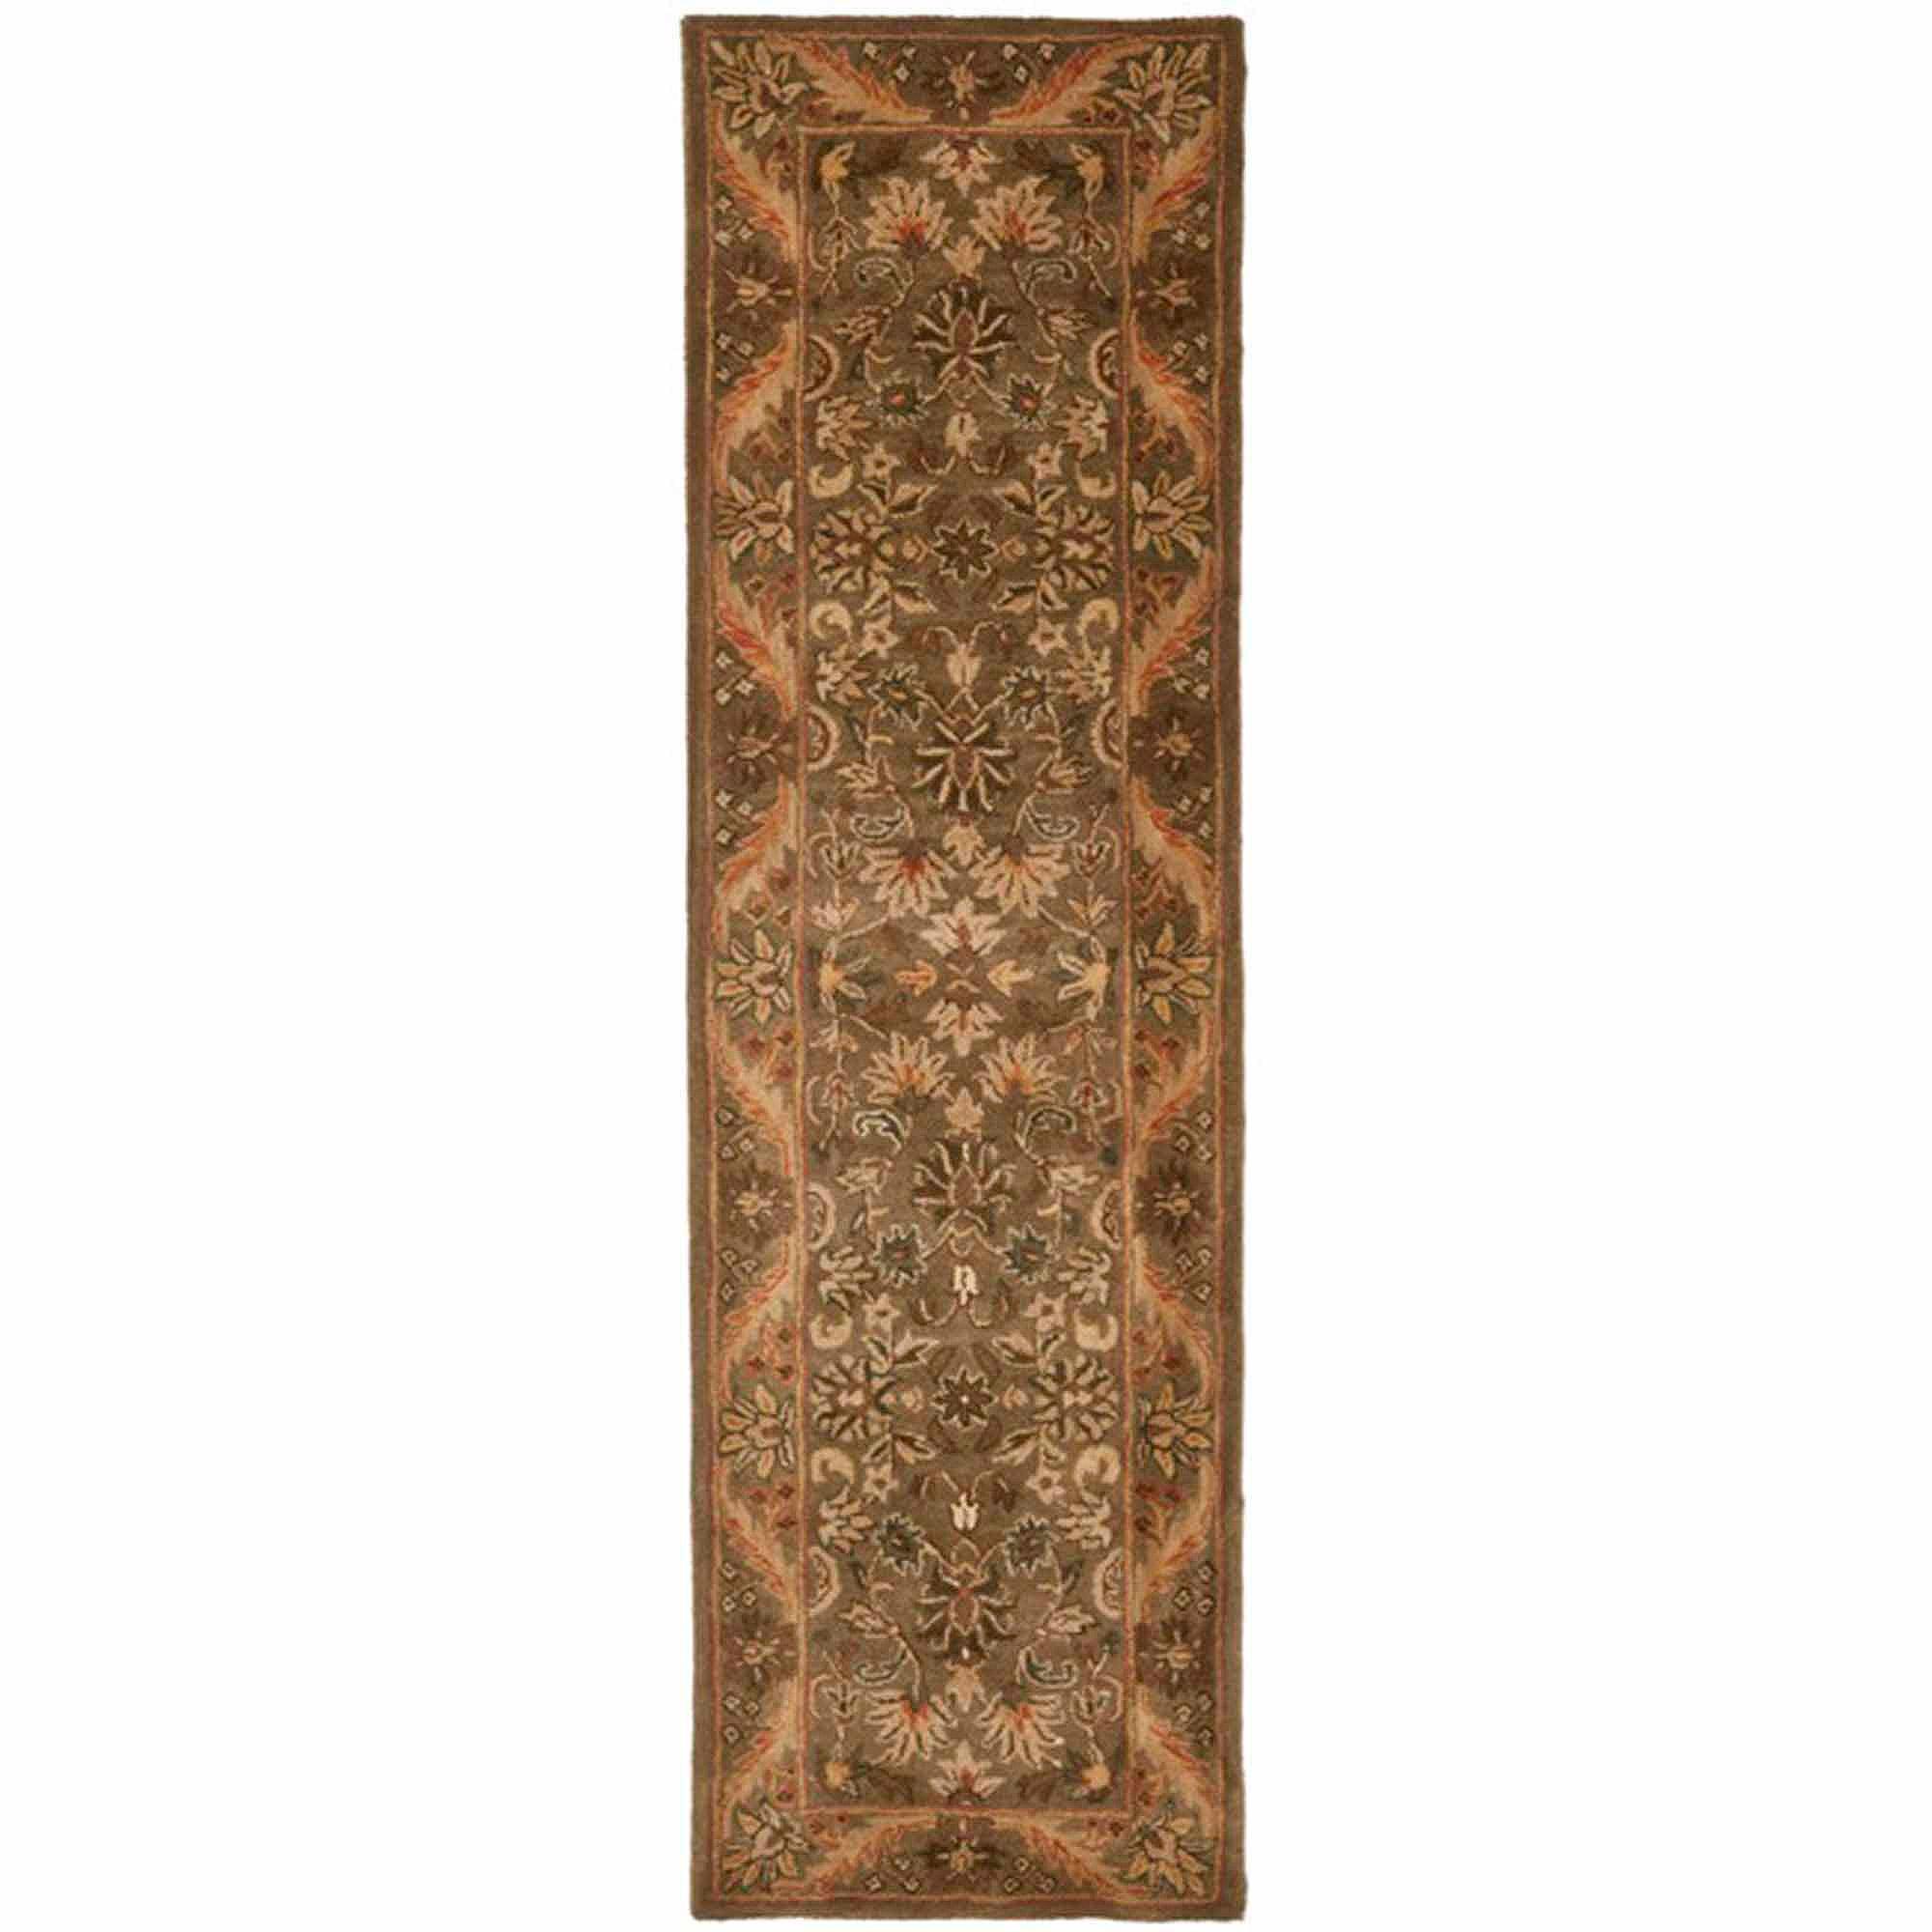 Safavieh Antiquity Rebecca Hand-Tufted Wool Runner Rug